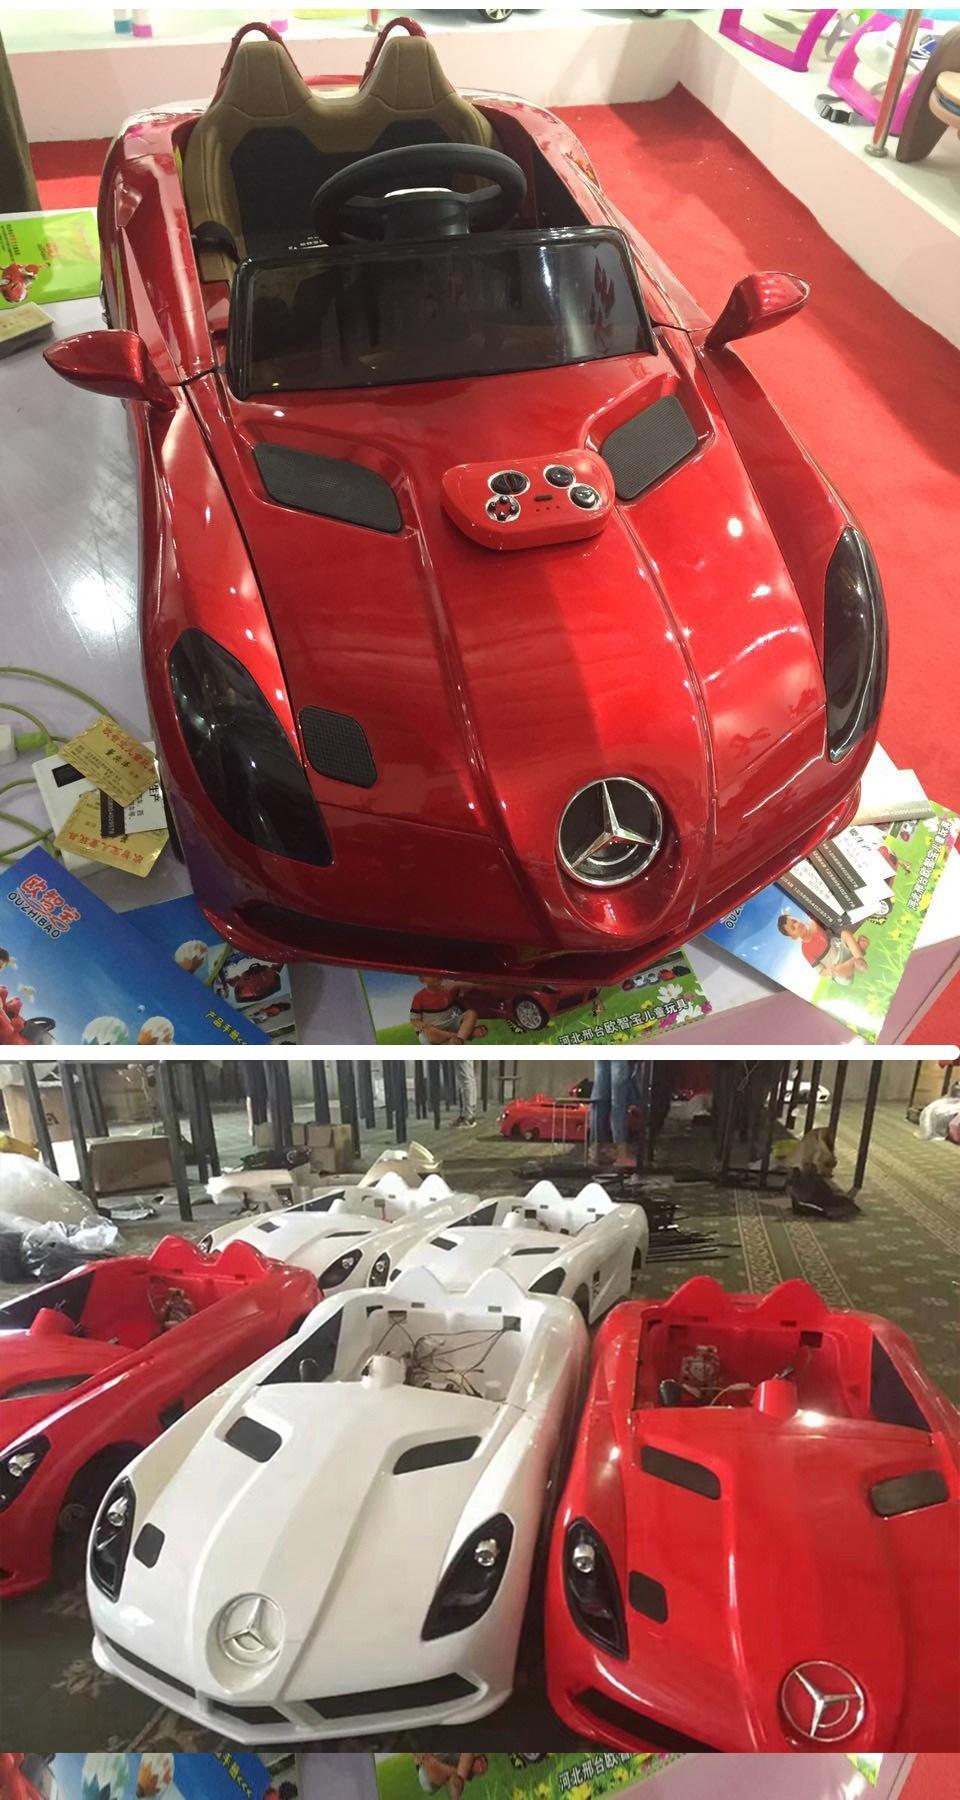 Model Four Wheel Drive Kids Electric Car Children Toys Car